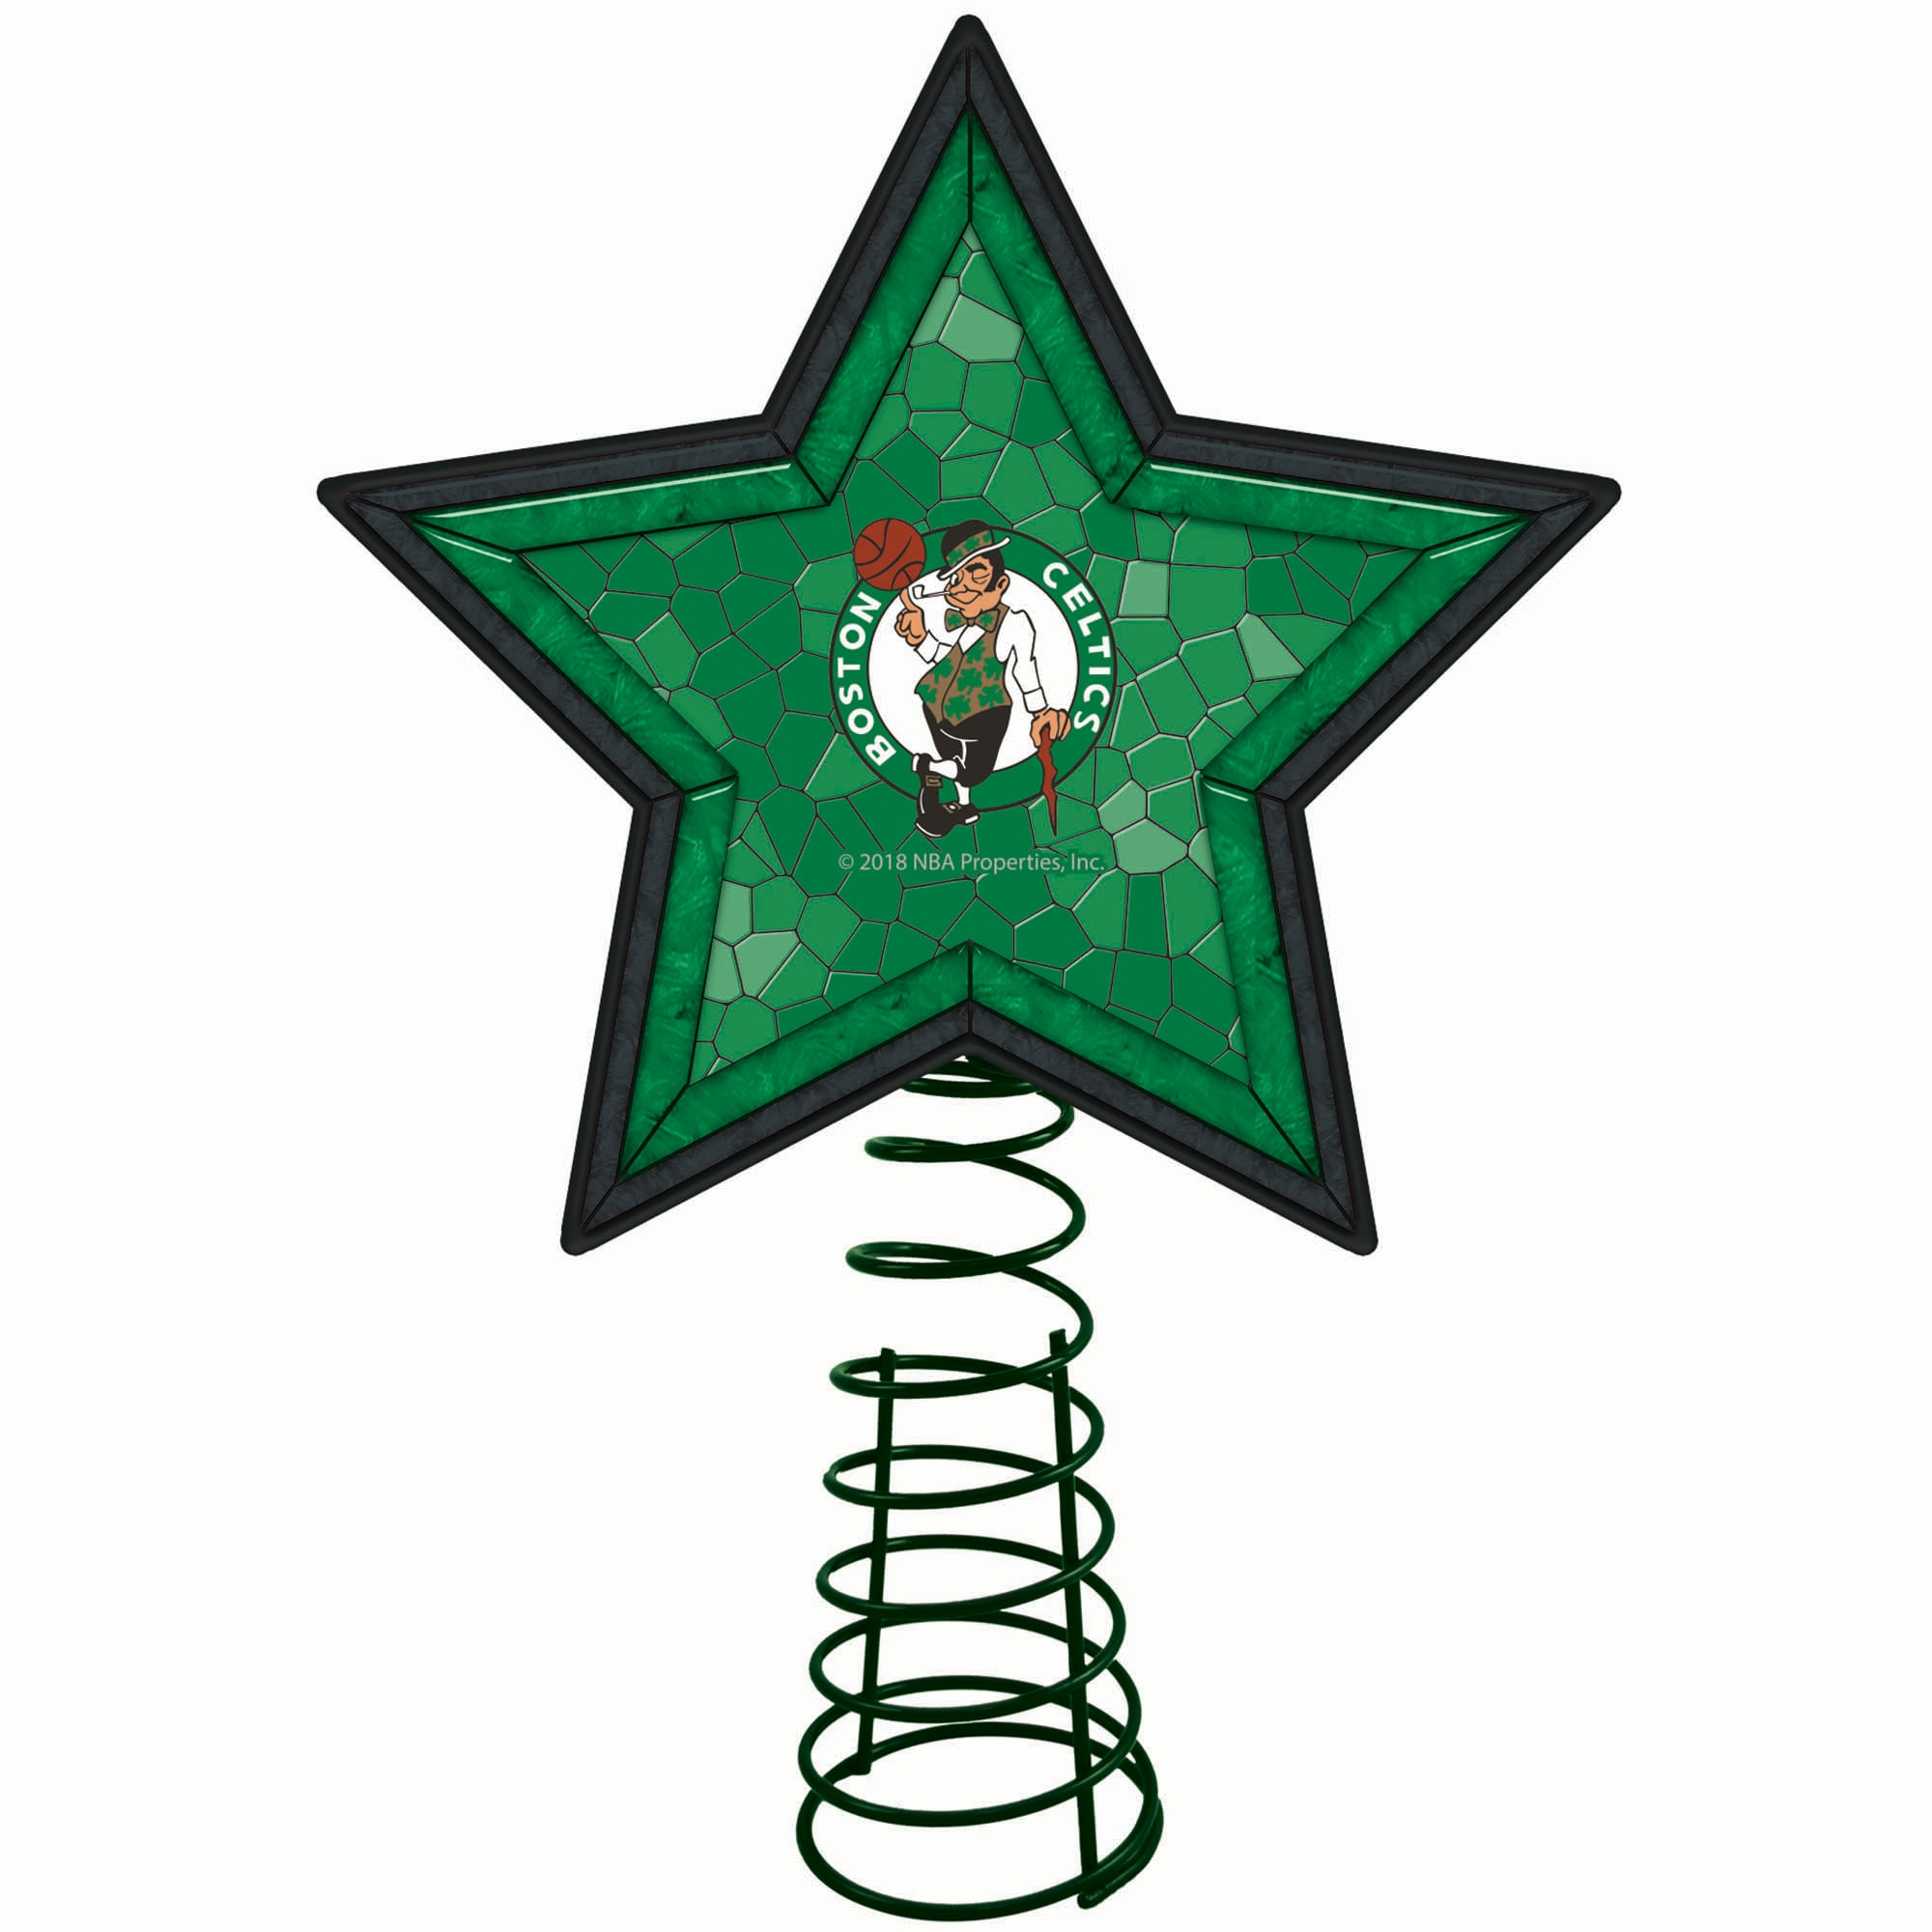 Boston Celtics Mosaic Tree Topper